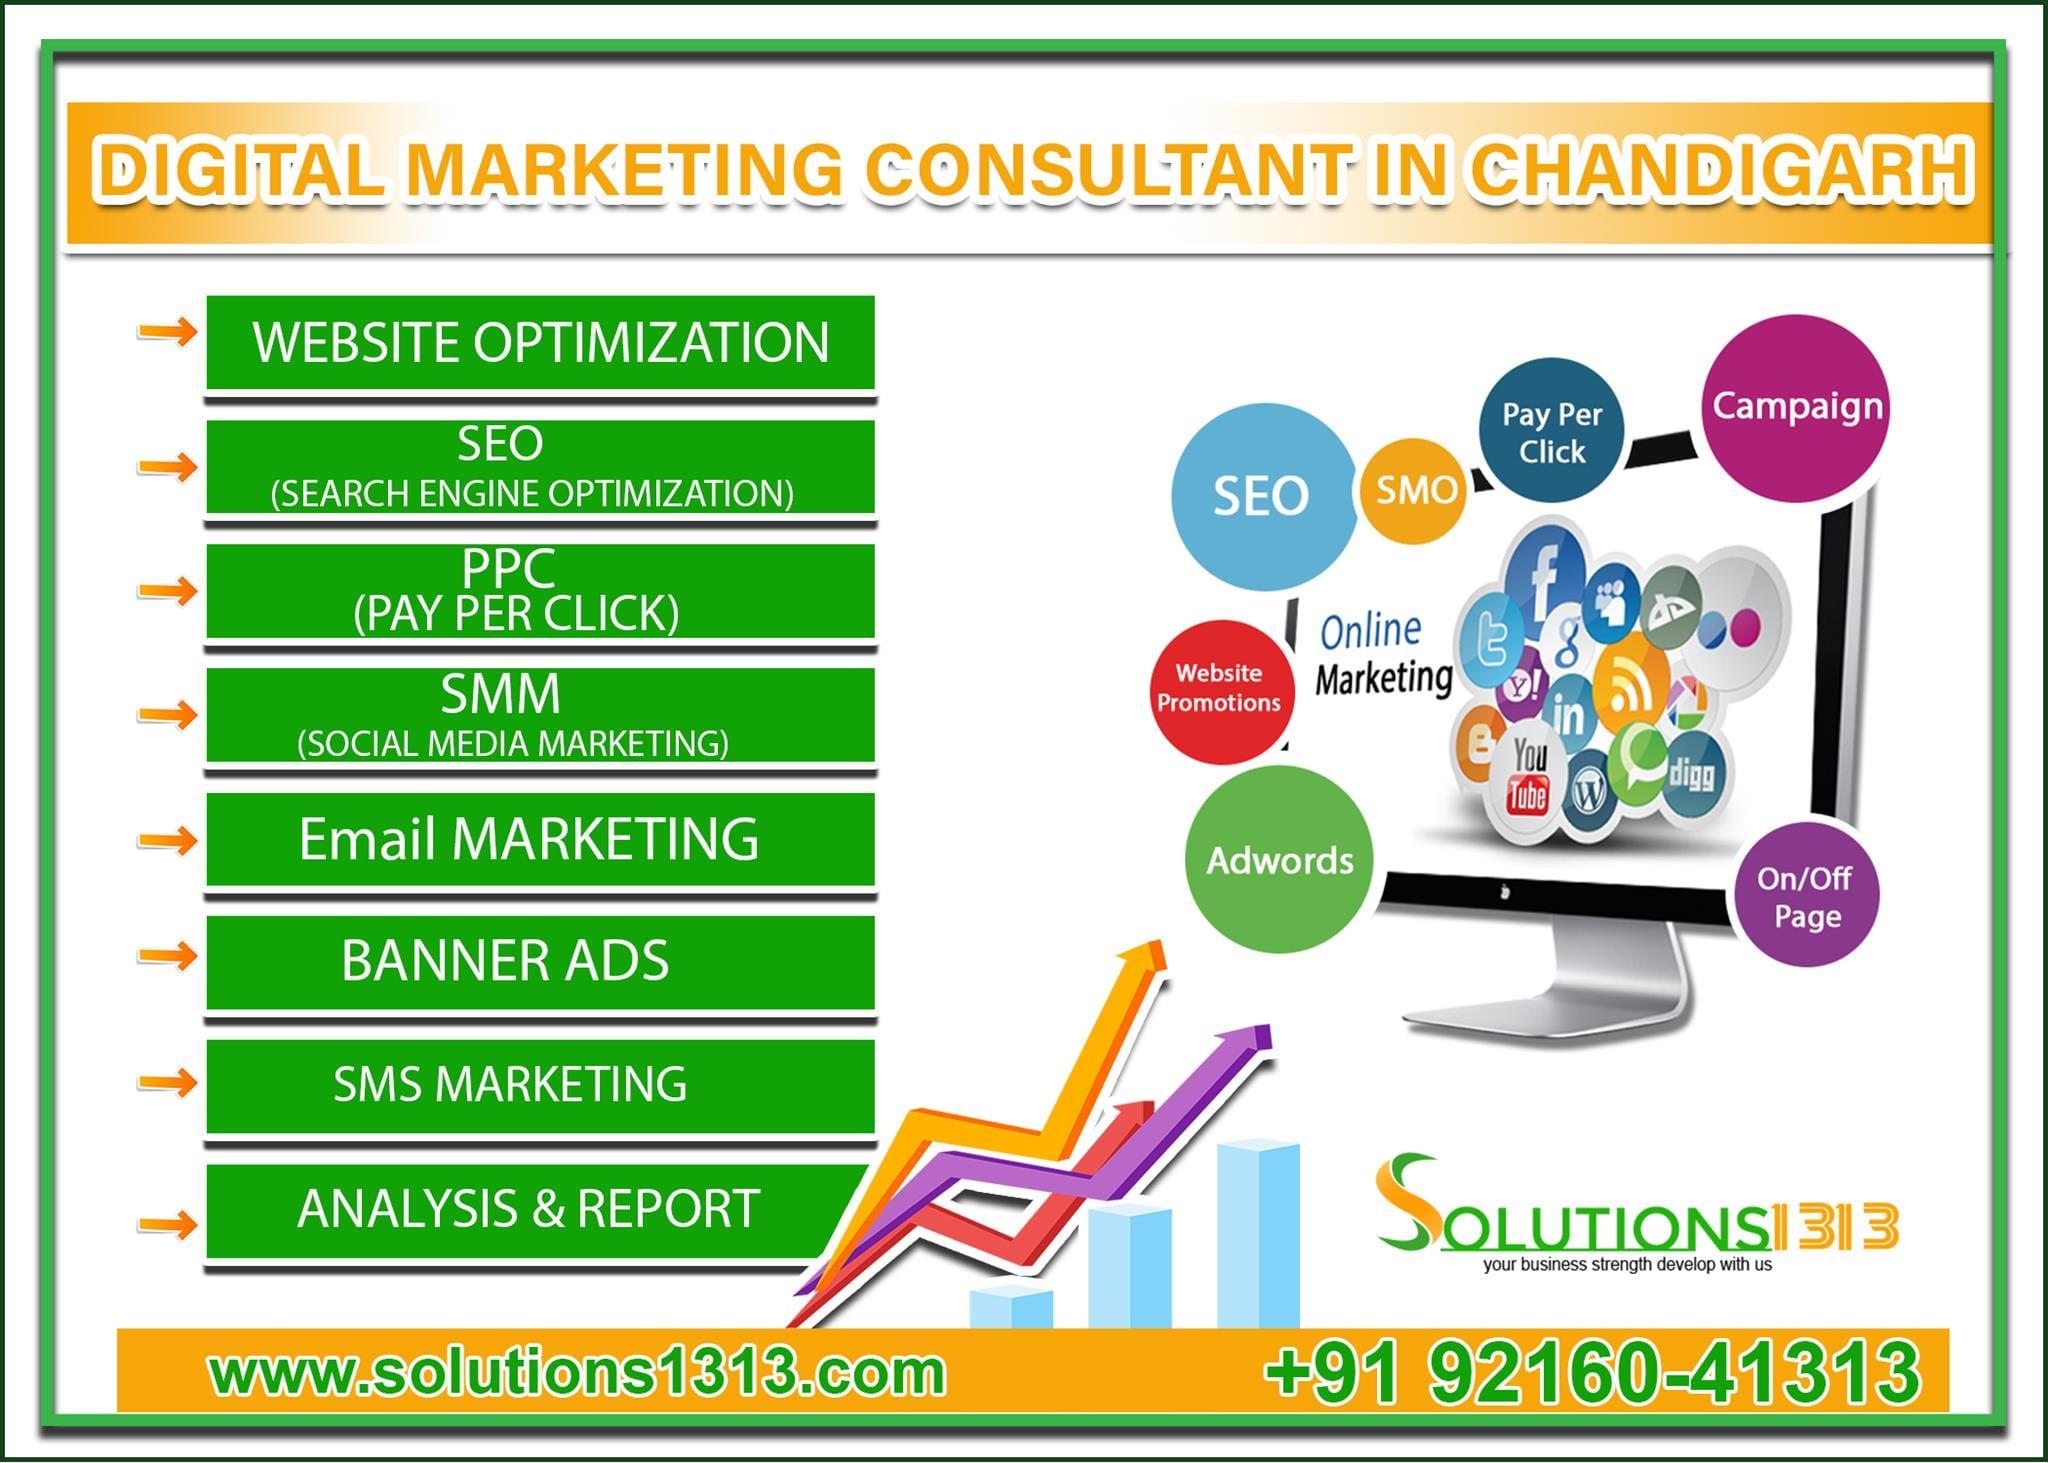 Digital Marketing Consultant in Chandigarh